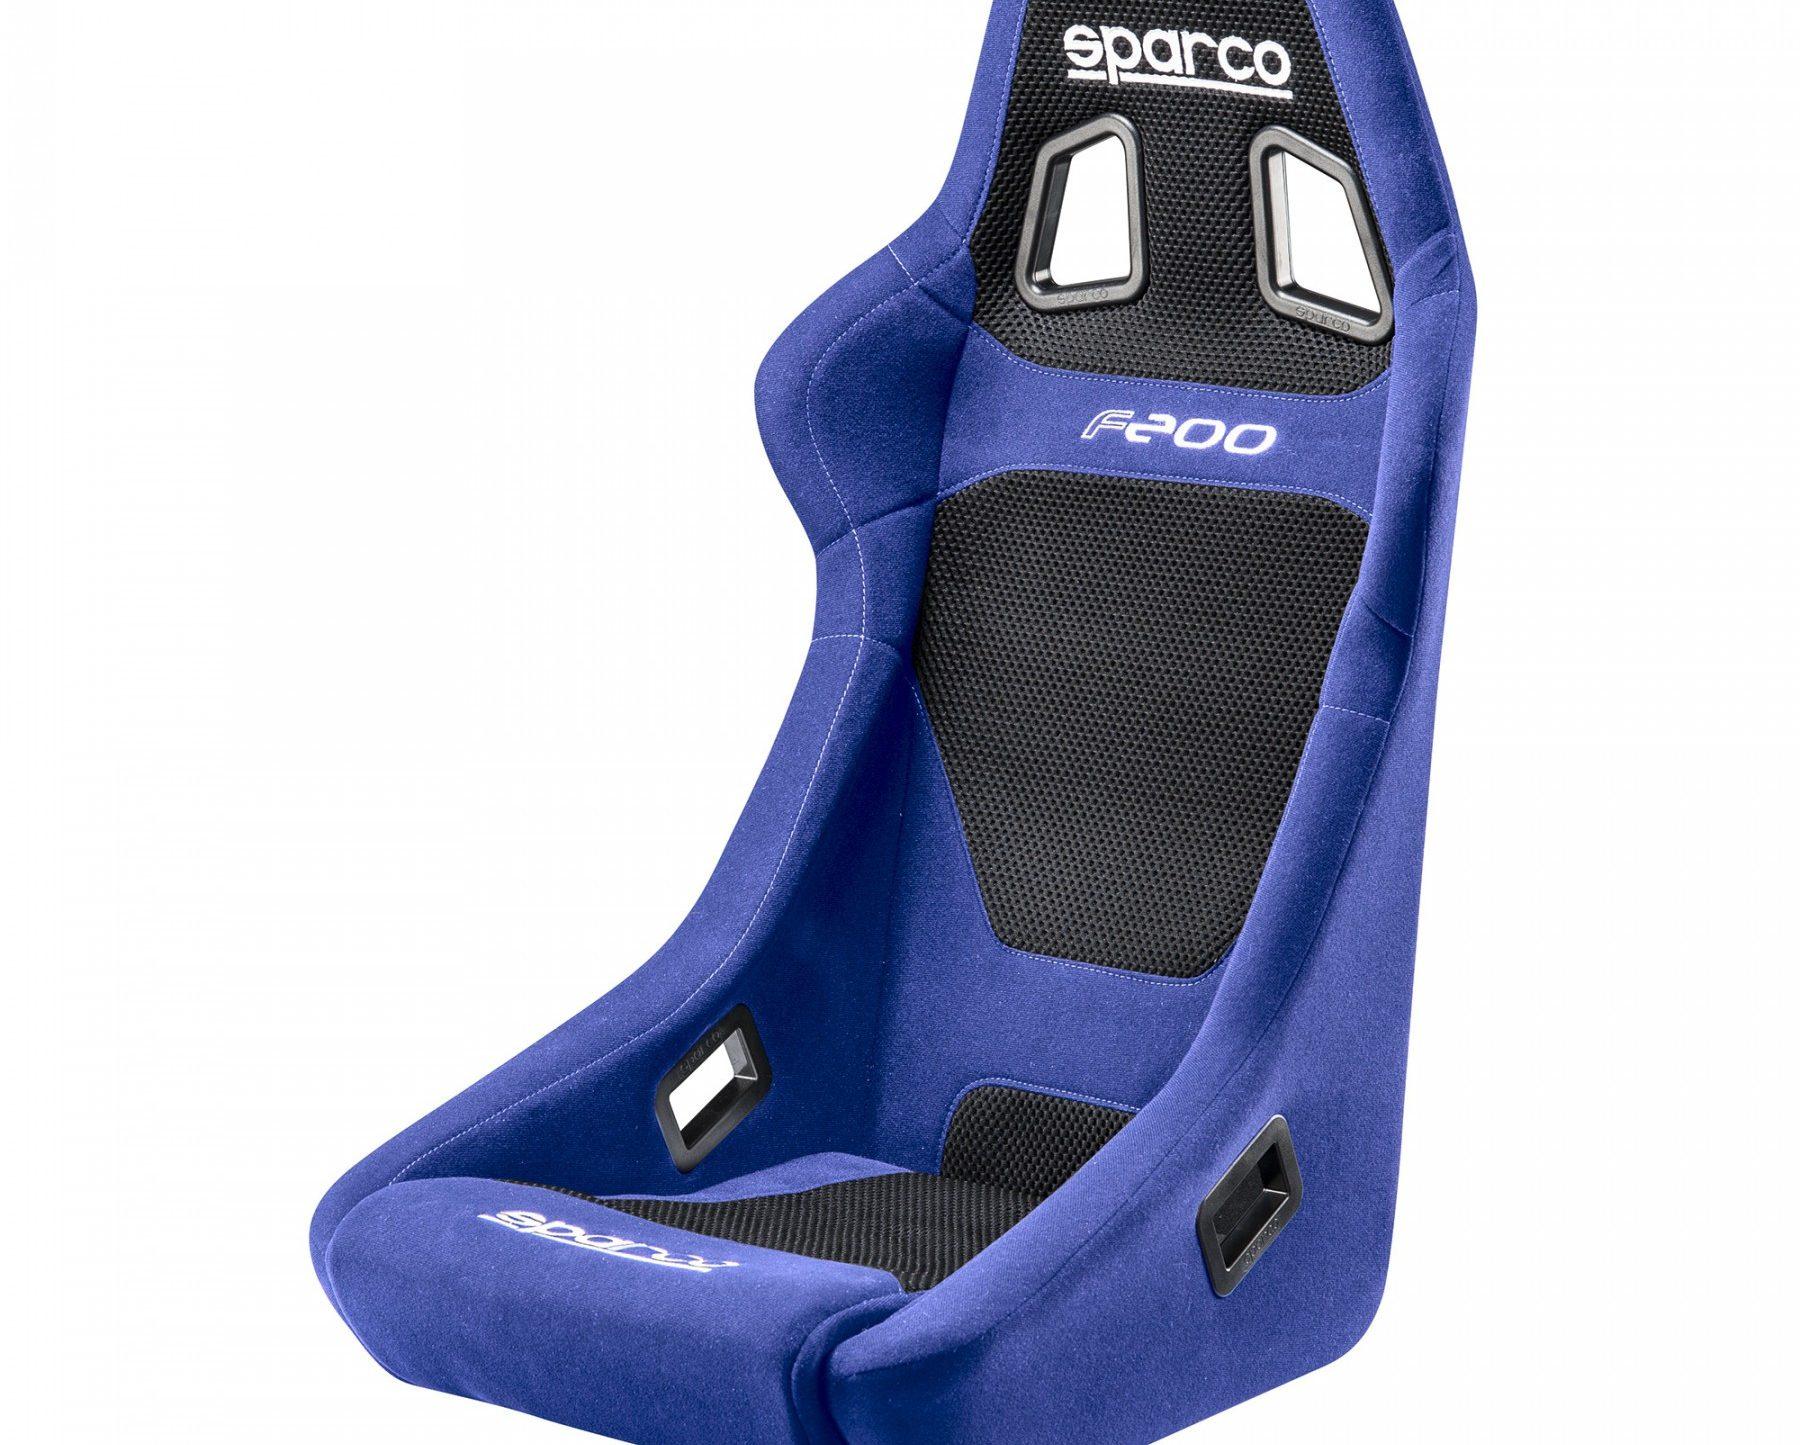 Нов продукт: Sparco F200, Tuning Seat